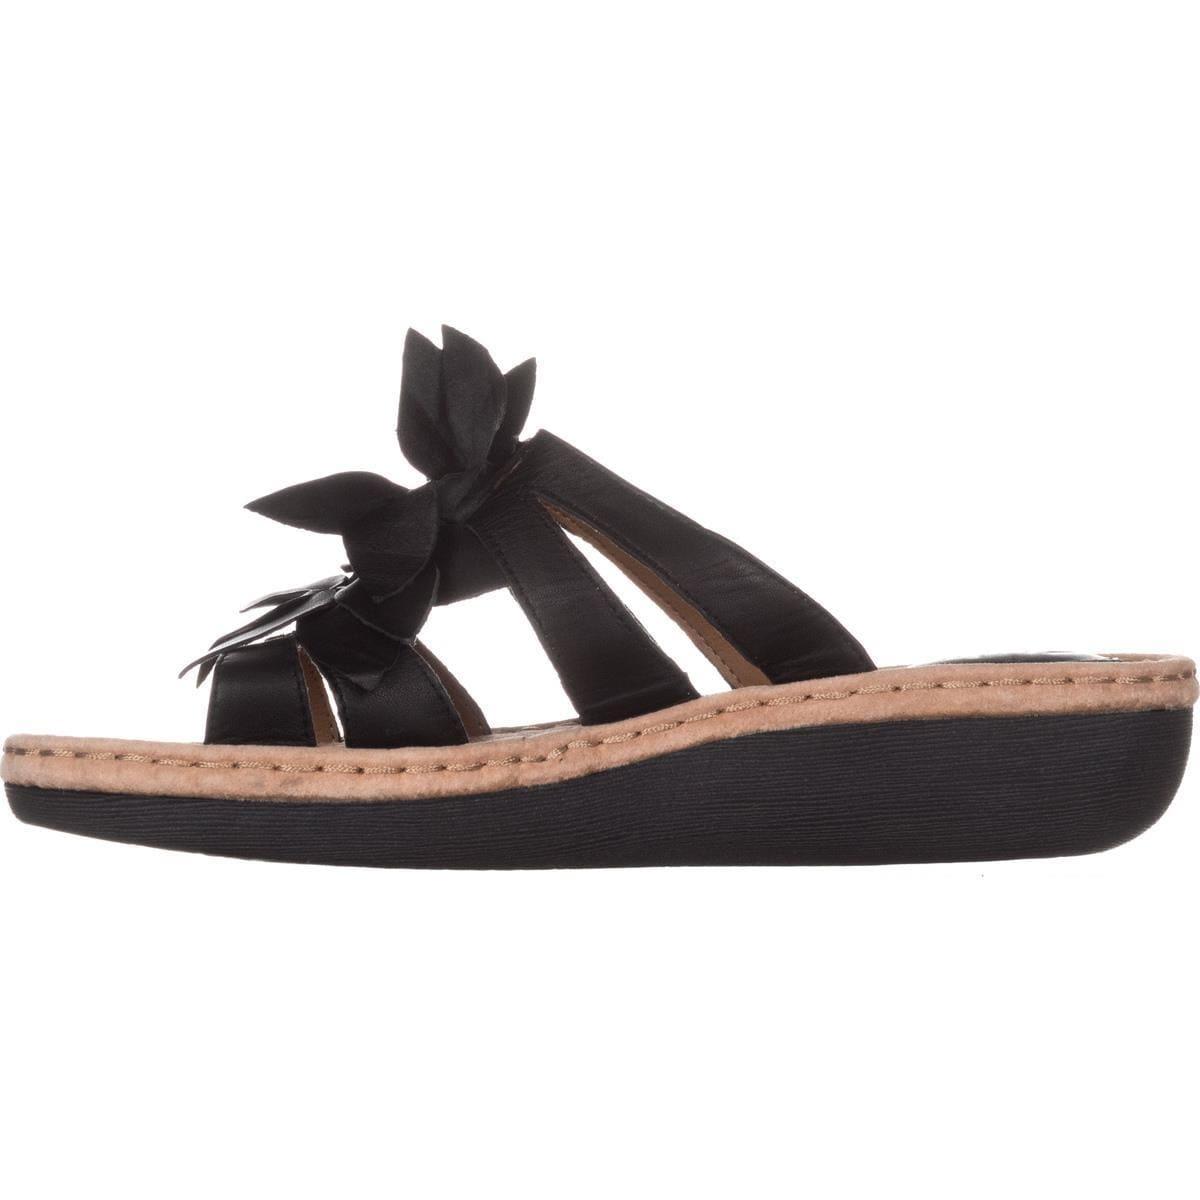 47a7ebc8f Shop Clarks Amaya Lilly Comfort Slip-On Sandals